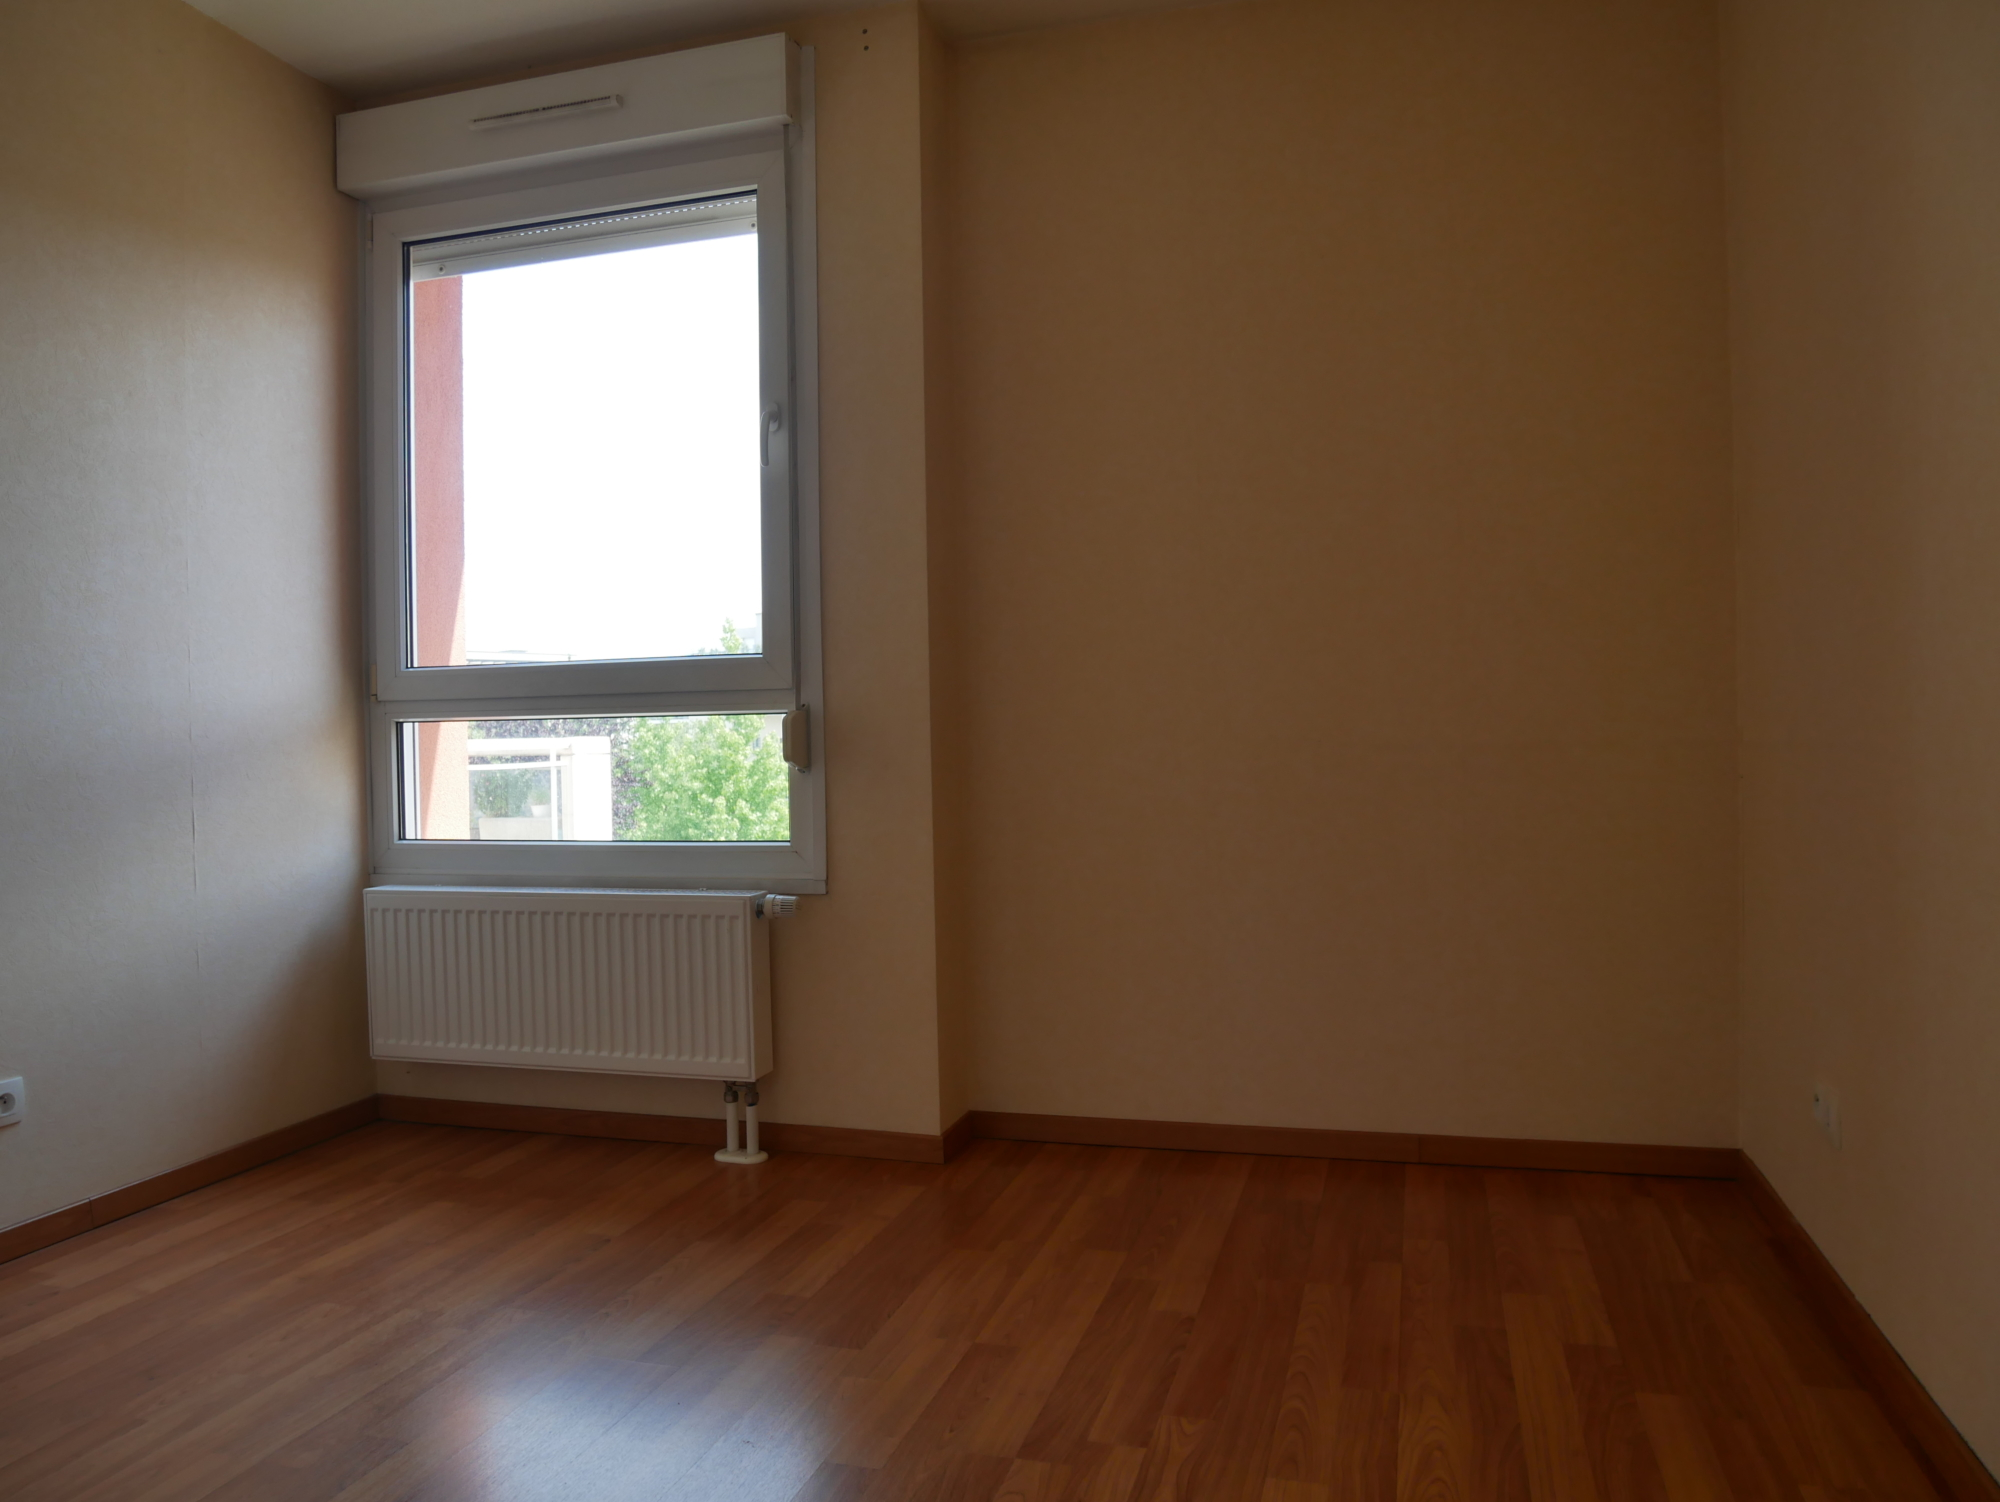 [Fresh] Lumineux 3 pièces avec balcon et parking - Souffelweyersheim - nos ventes - Beausite Immobilier 8